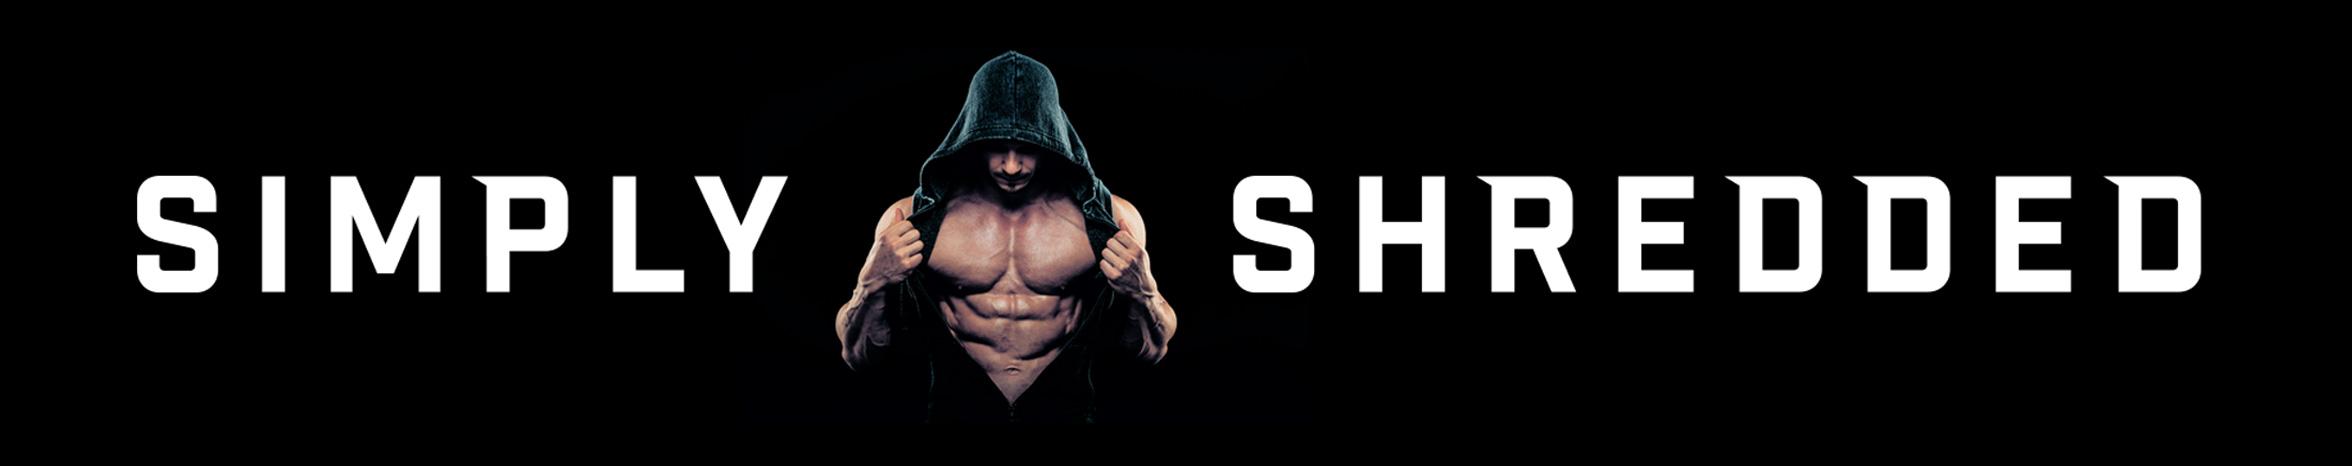 SimplyShredded.com